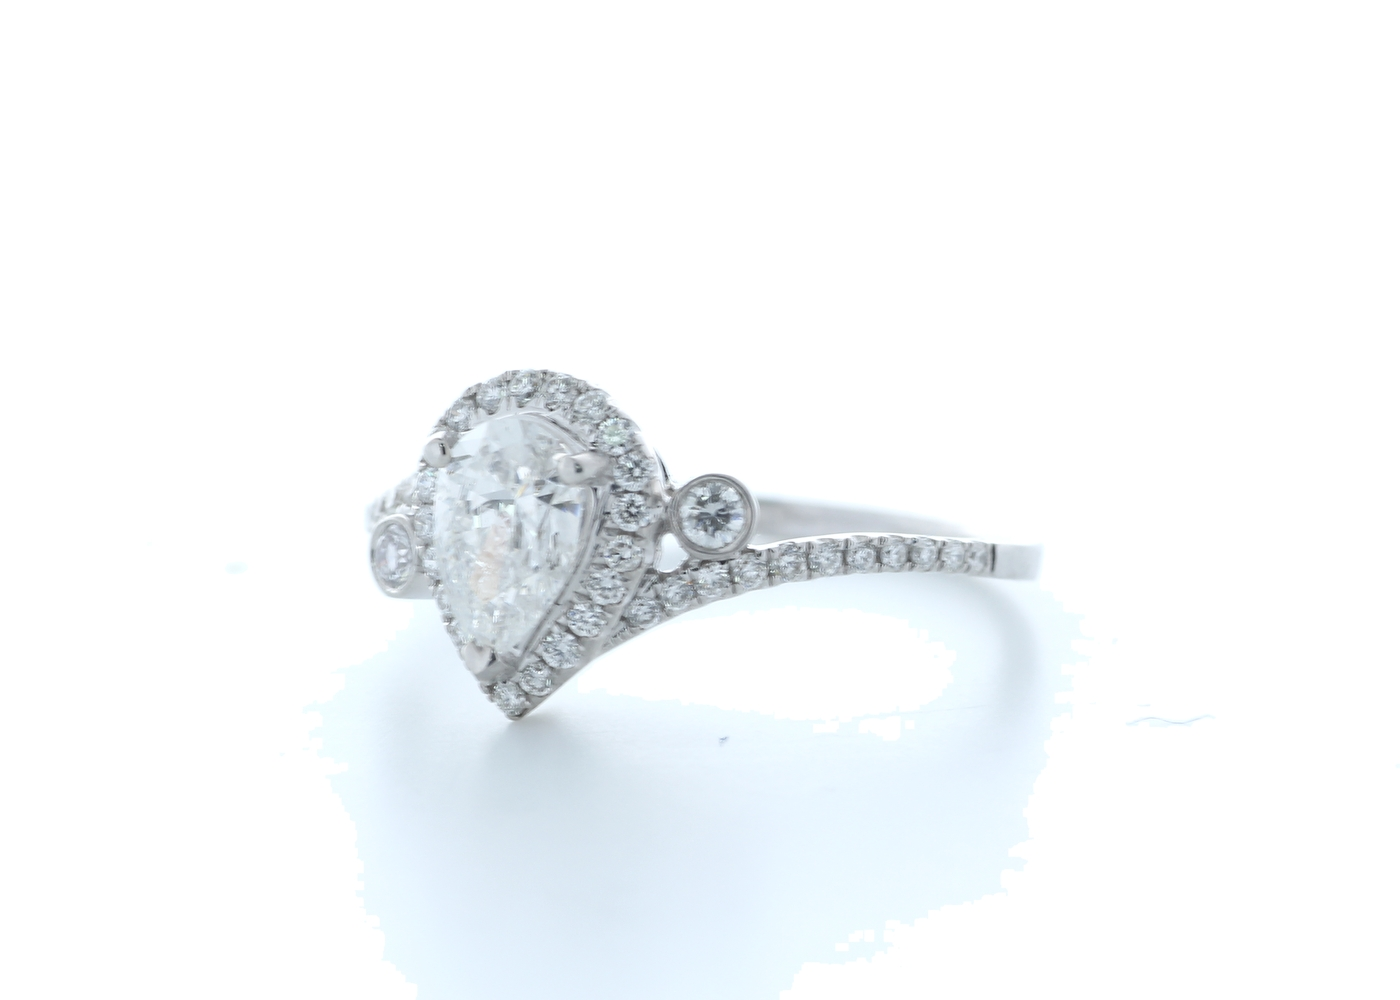 18ct White Gold Pear Shape Halo Diamond Ring 0.76 (0.51) Carats - Image 2 of 5